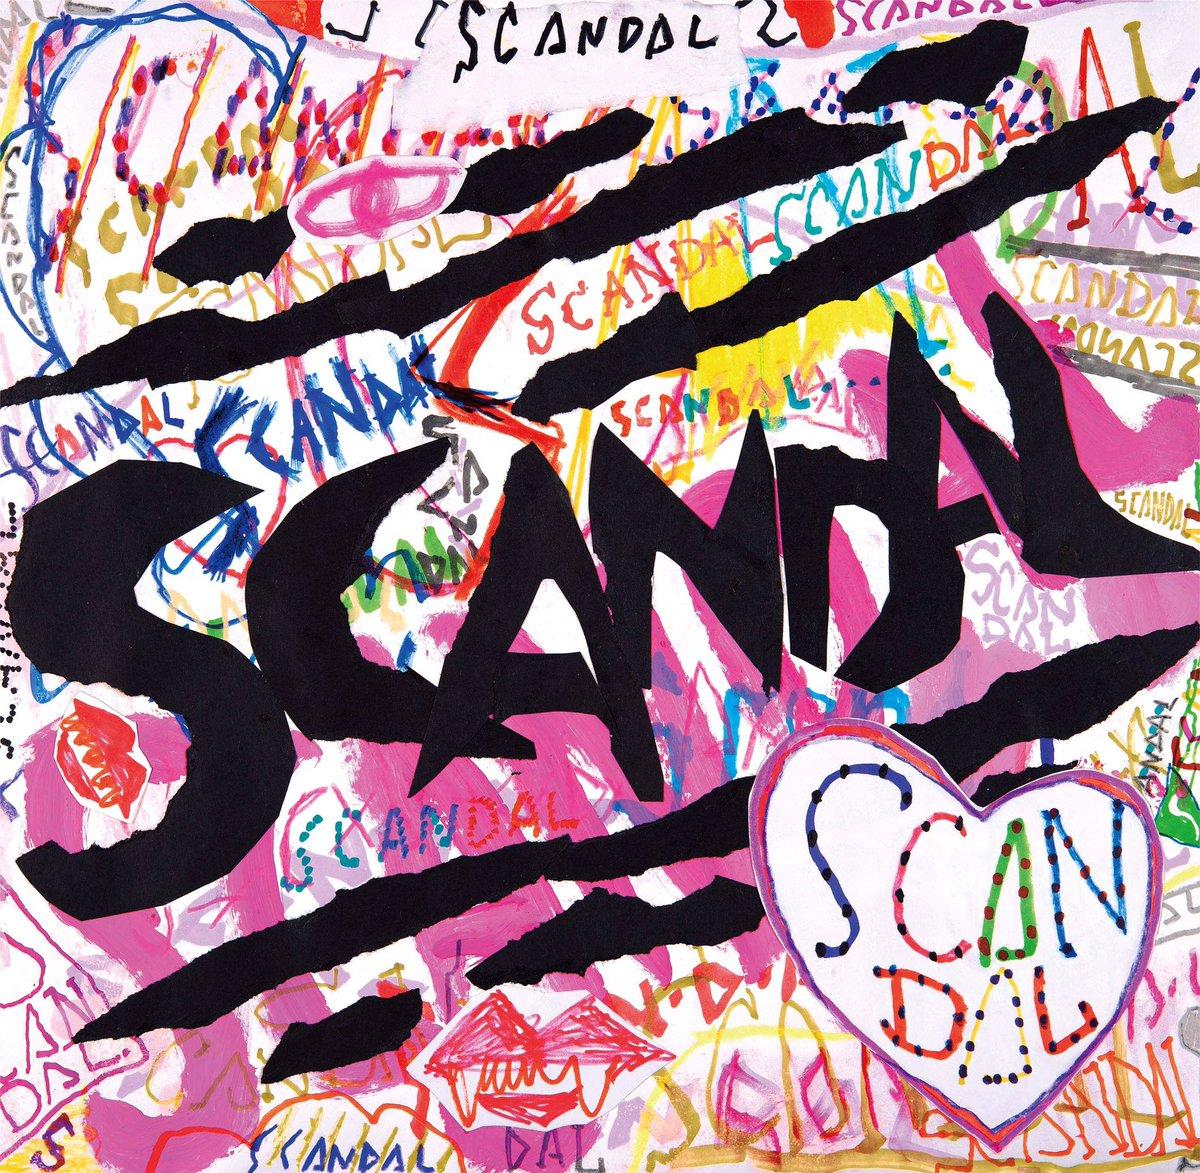 【#SCANDAL/#scabest47】 2/15(水)発売 BEST ALBUM『SCANDAL…